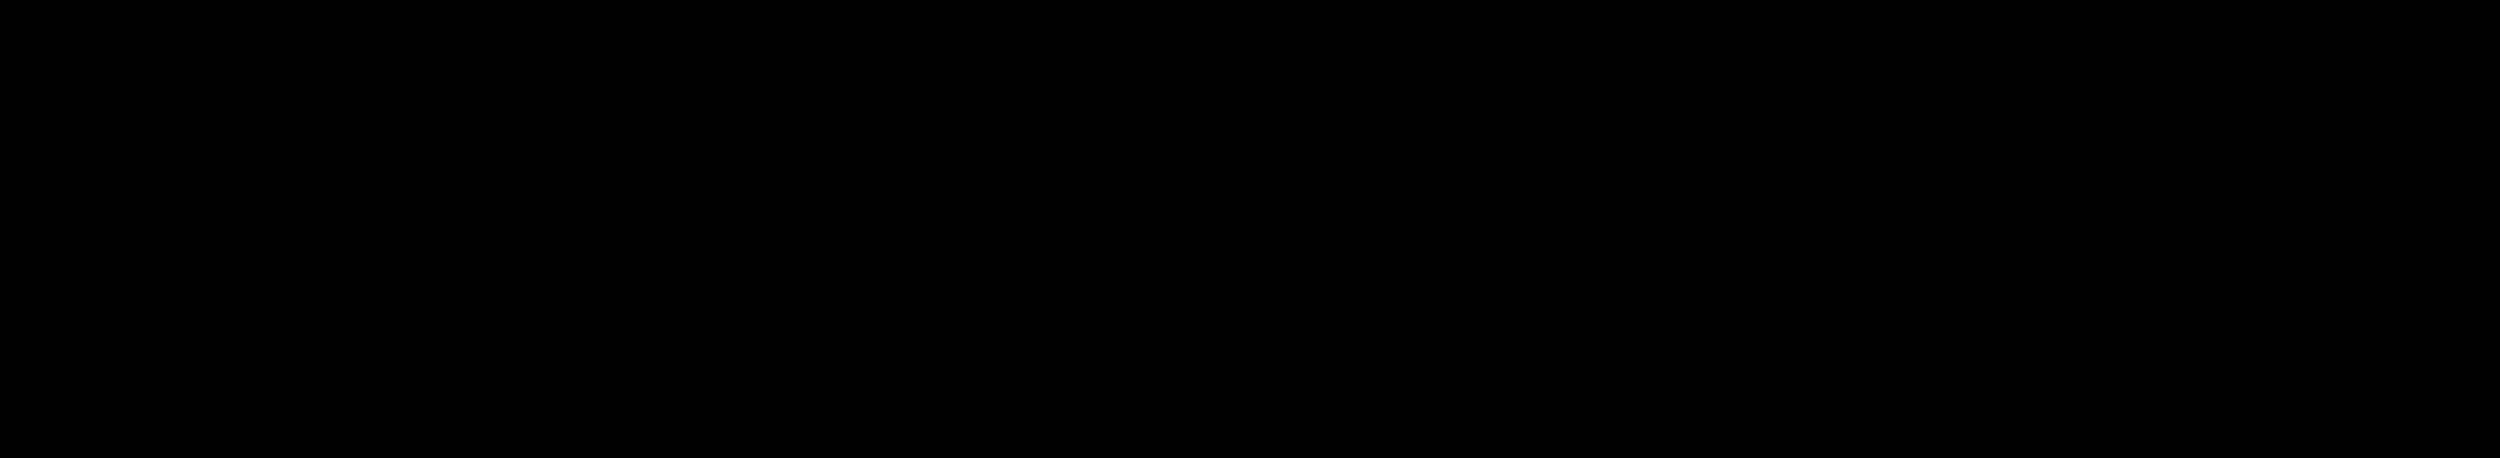 Menicon lenzen